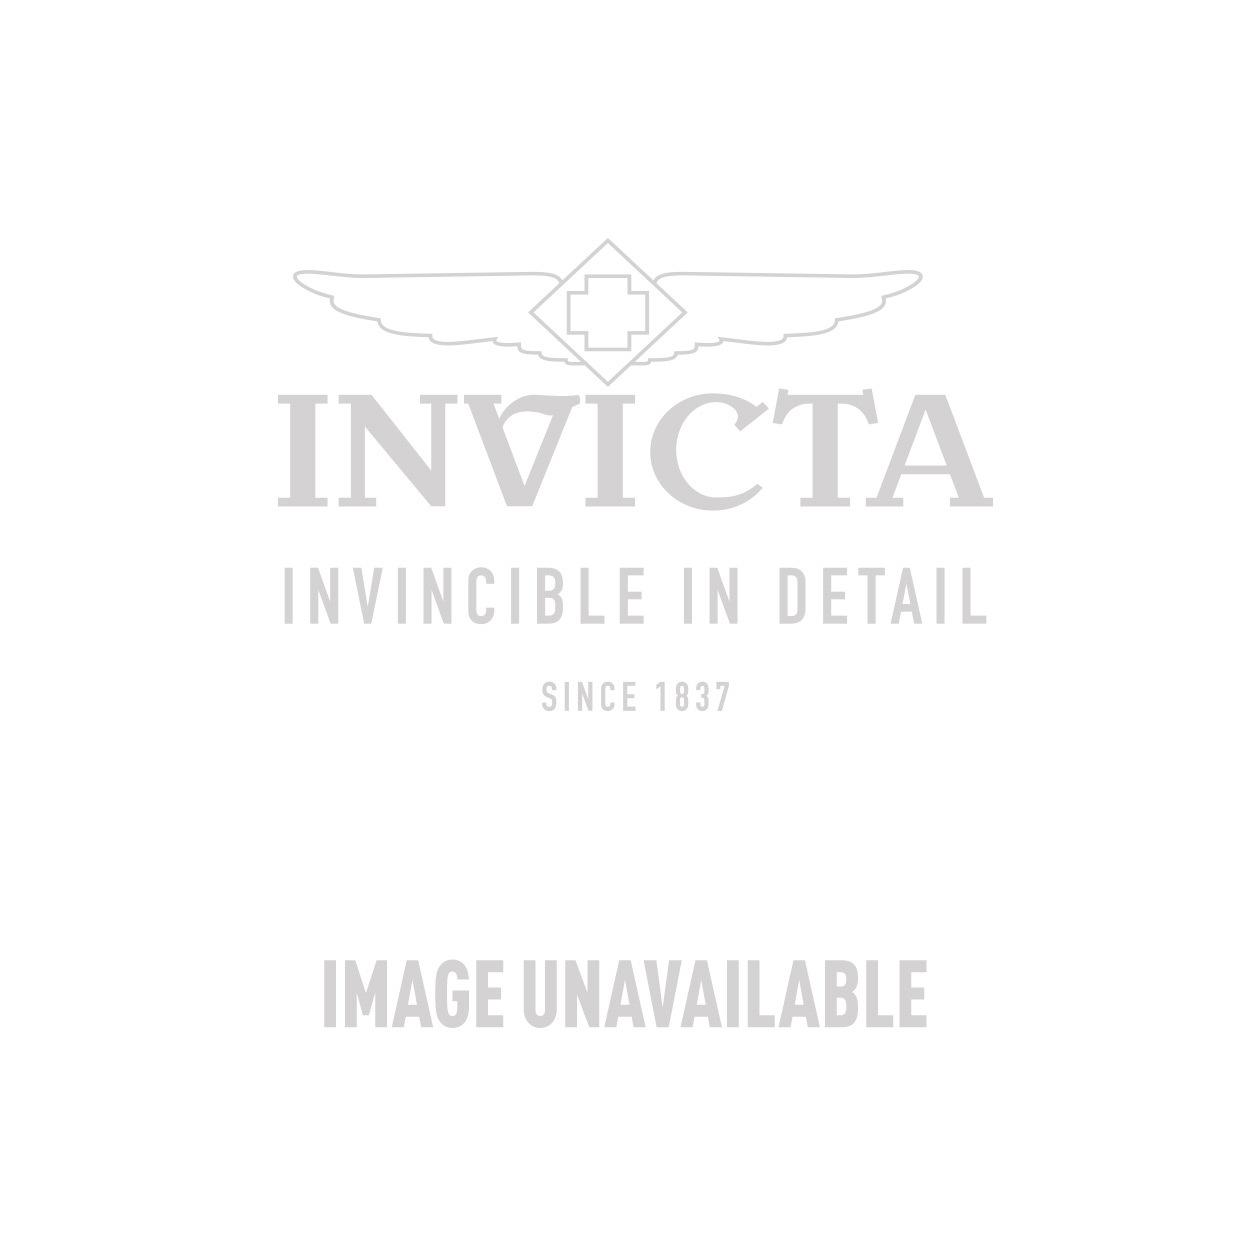 Invicta Corduba Swiss Movement Quartz Watch - Stainless Steel case with Steel, Black tone Stainless Steel, Polyurethane band - Model 6674